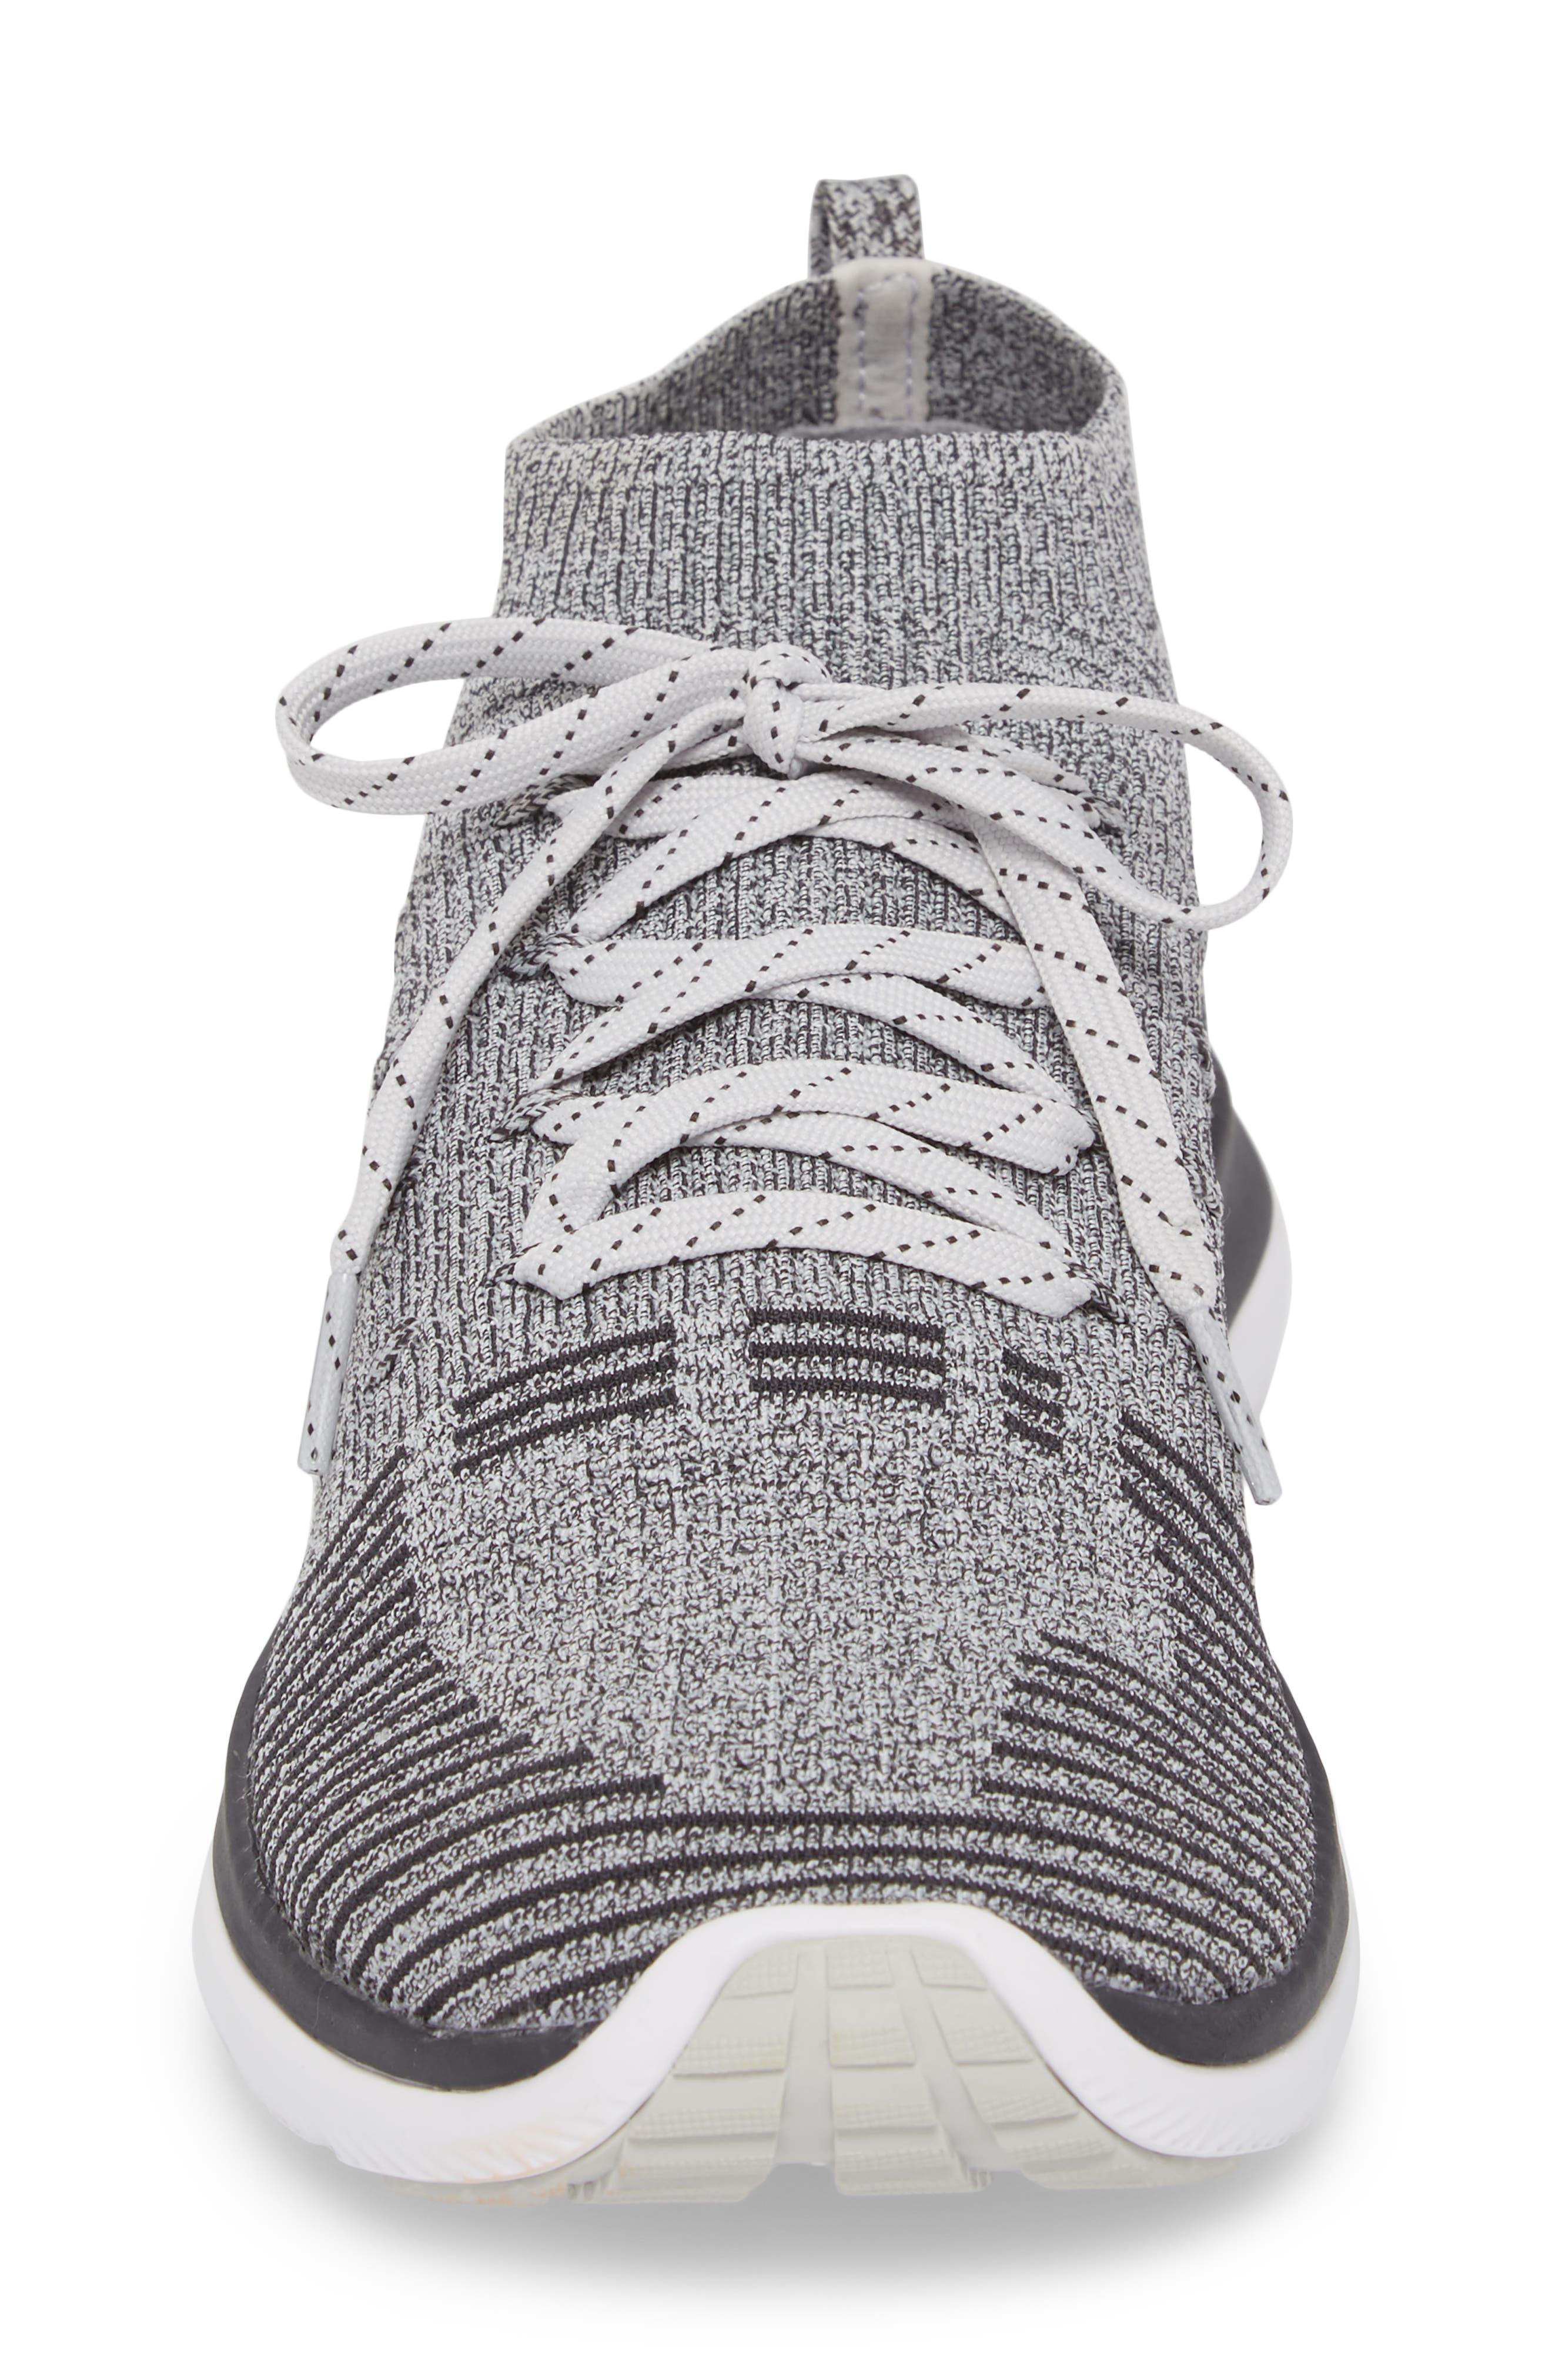 Slingflex Rise Sneaker,                             Alternate thumbnail 4, color,                             ELEMENTAL/ ANTHRACITE